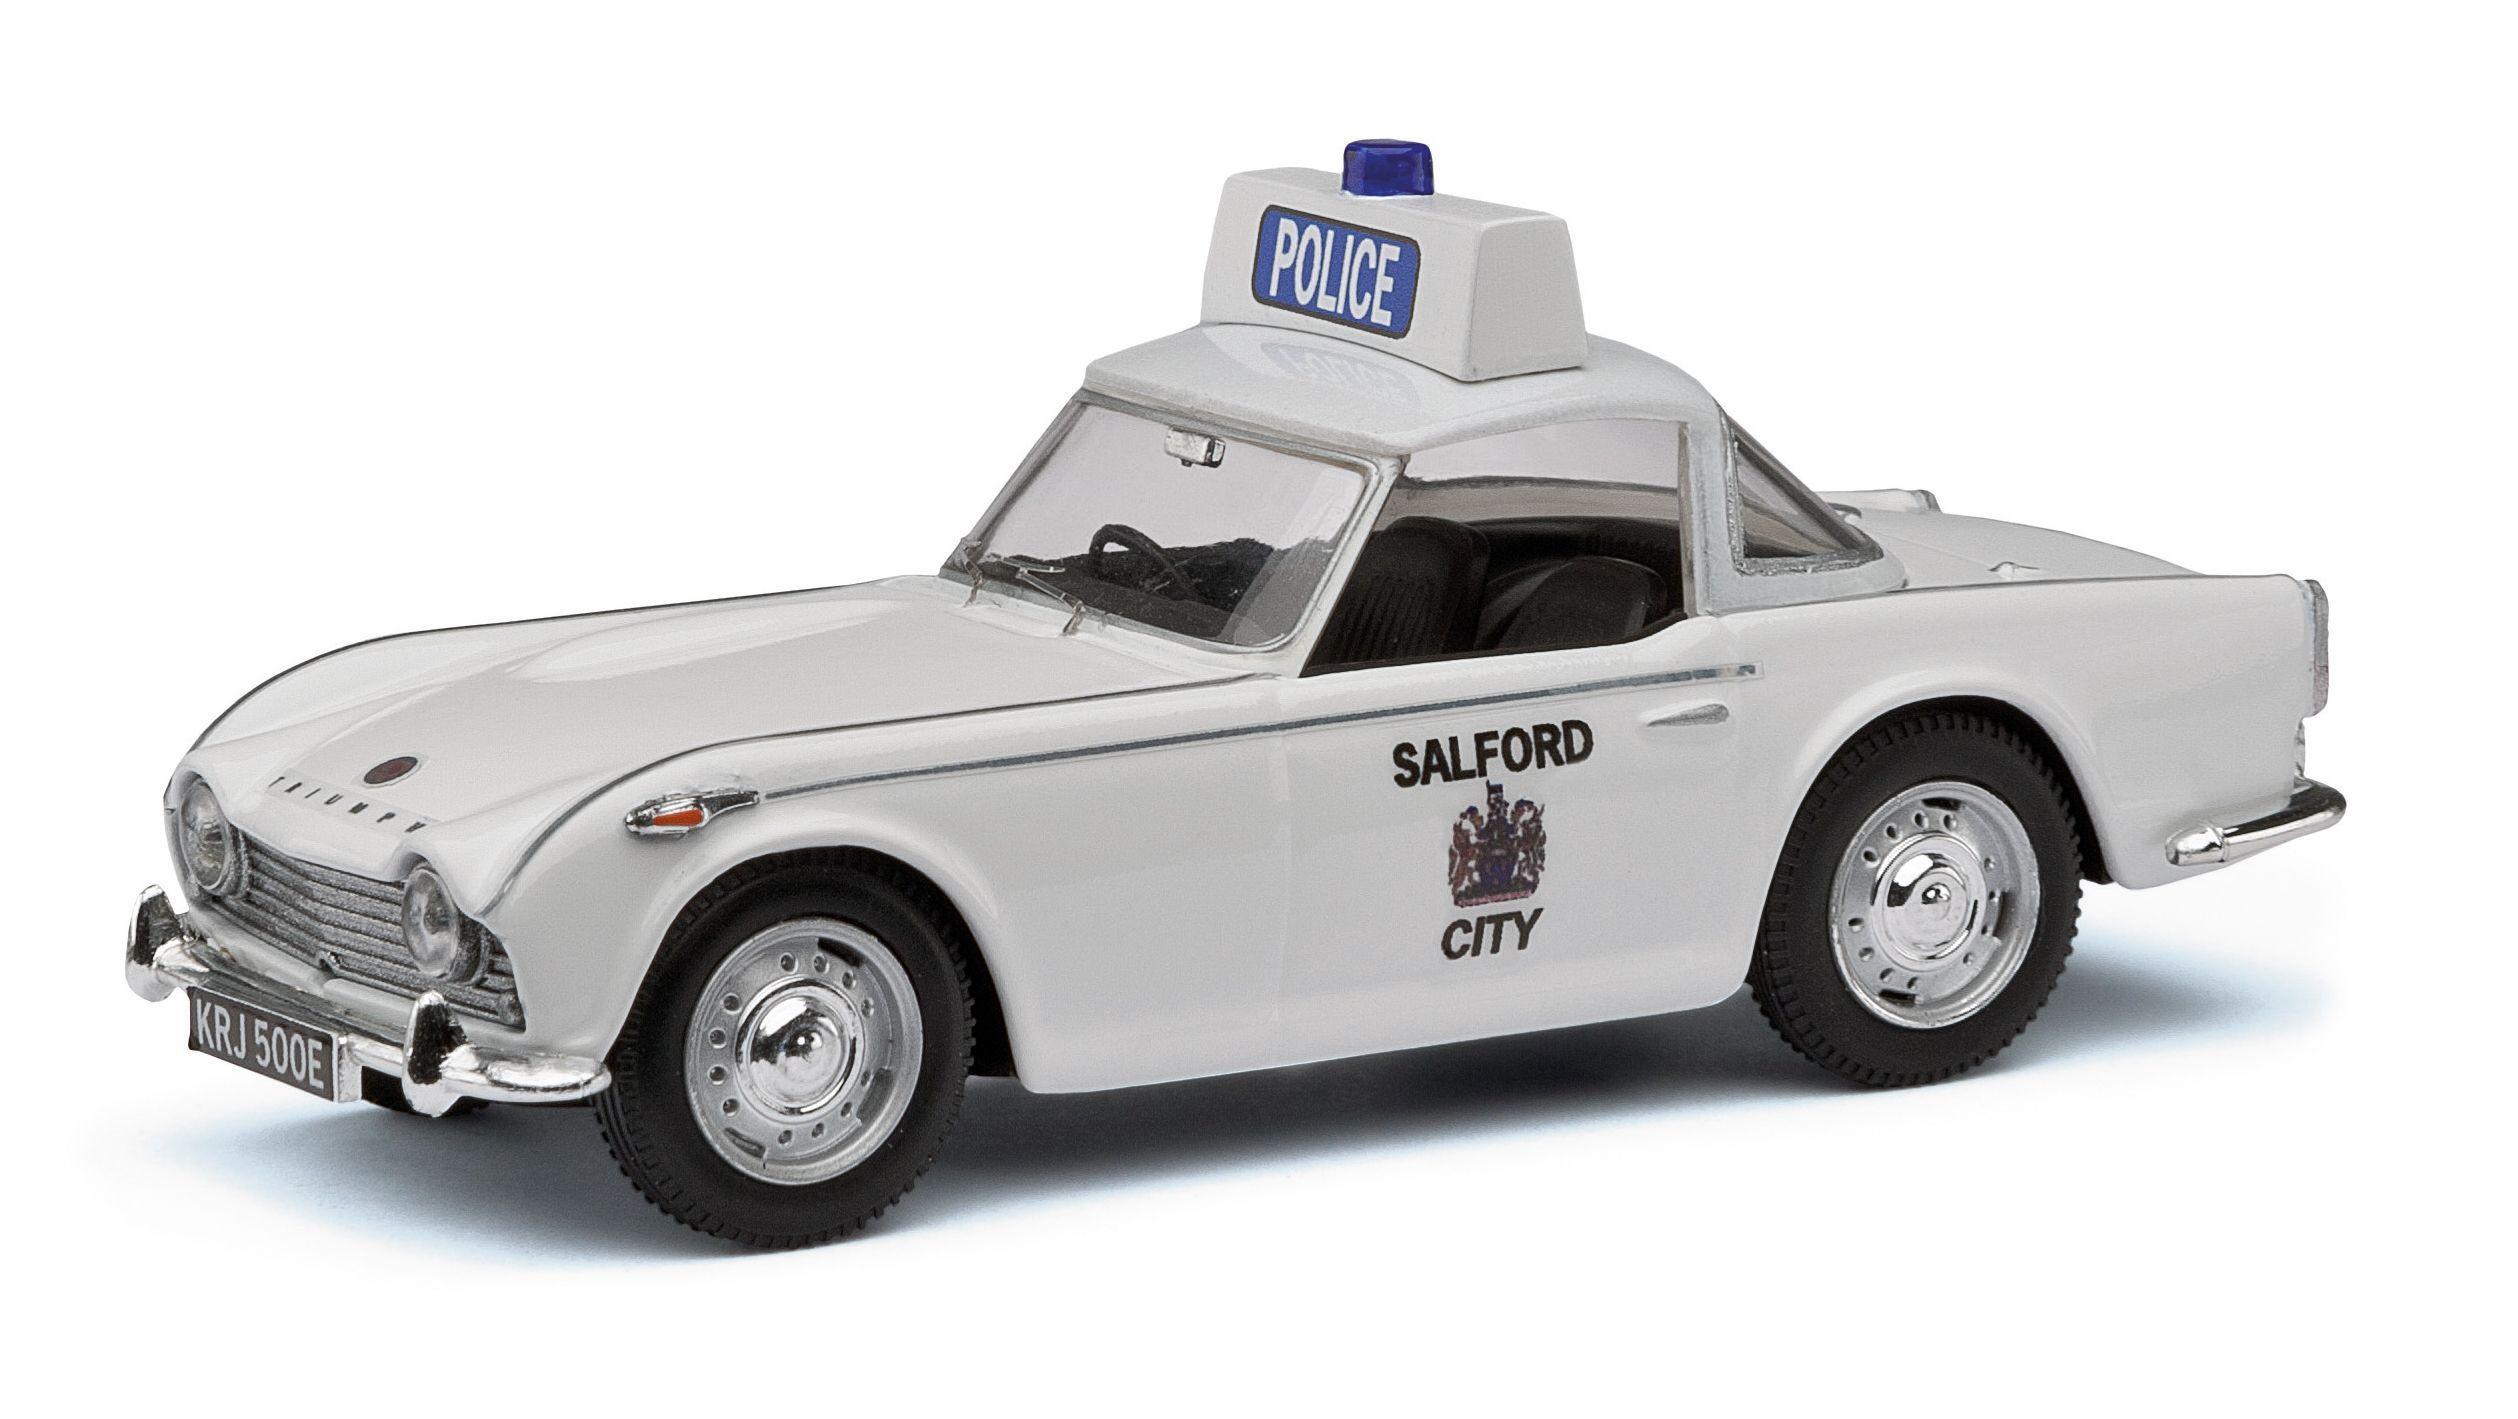 LEGO DUPLO 1x policier police homme bleu personnage F voiture voiture de police 47394pb034